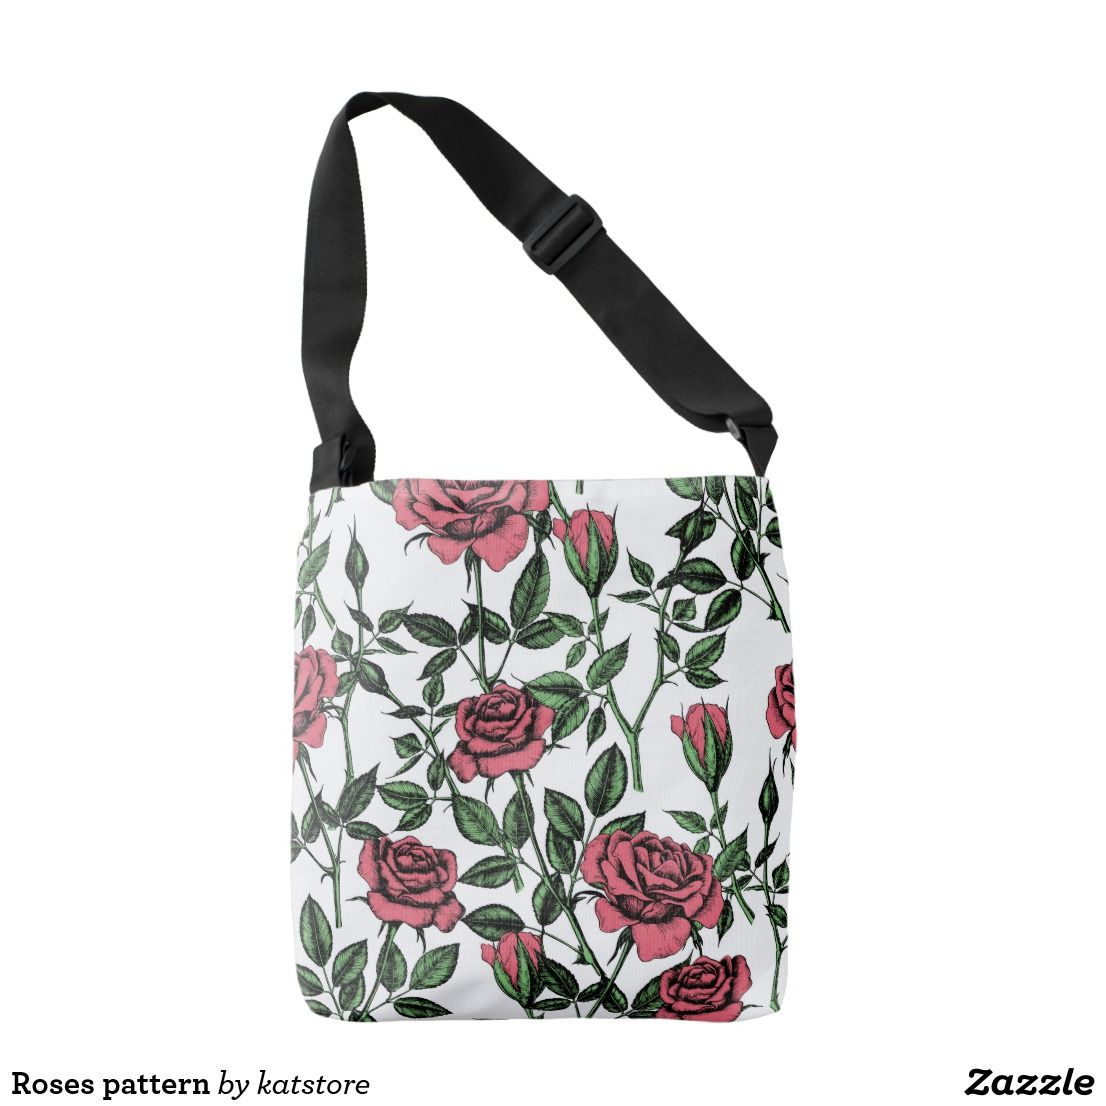 dc7cc9a60c Roses pattern crossbody bag  zazzle  bag  tote  roses  pattern  vintage   drawing  floral  botanical  katerinakart